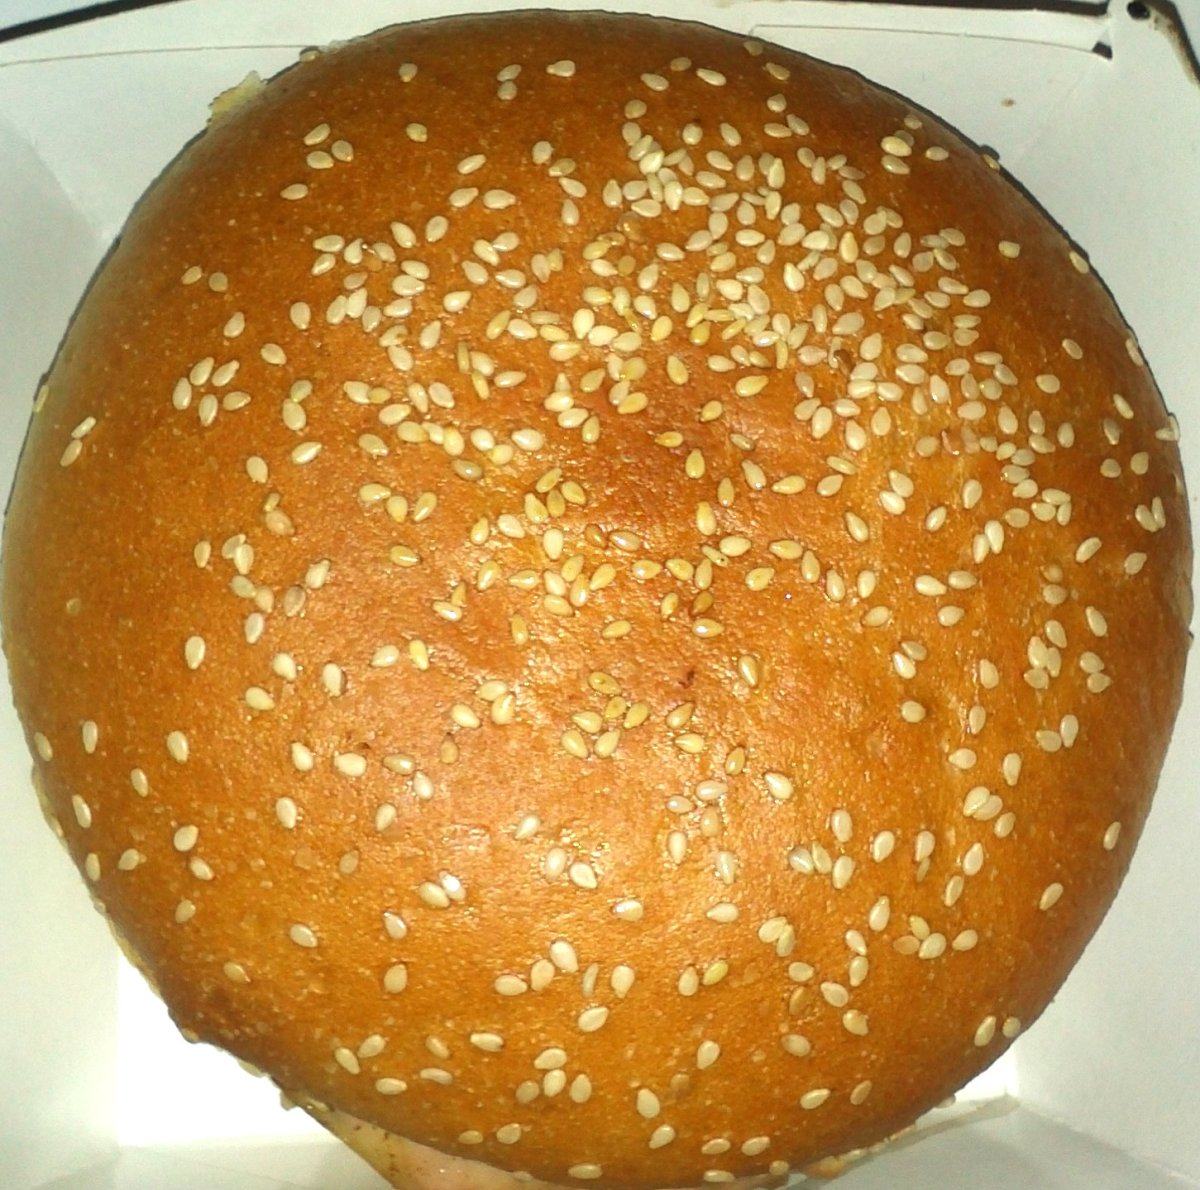 burger-Happy-burger-hossegor-no-filter